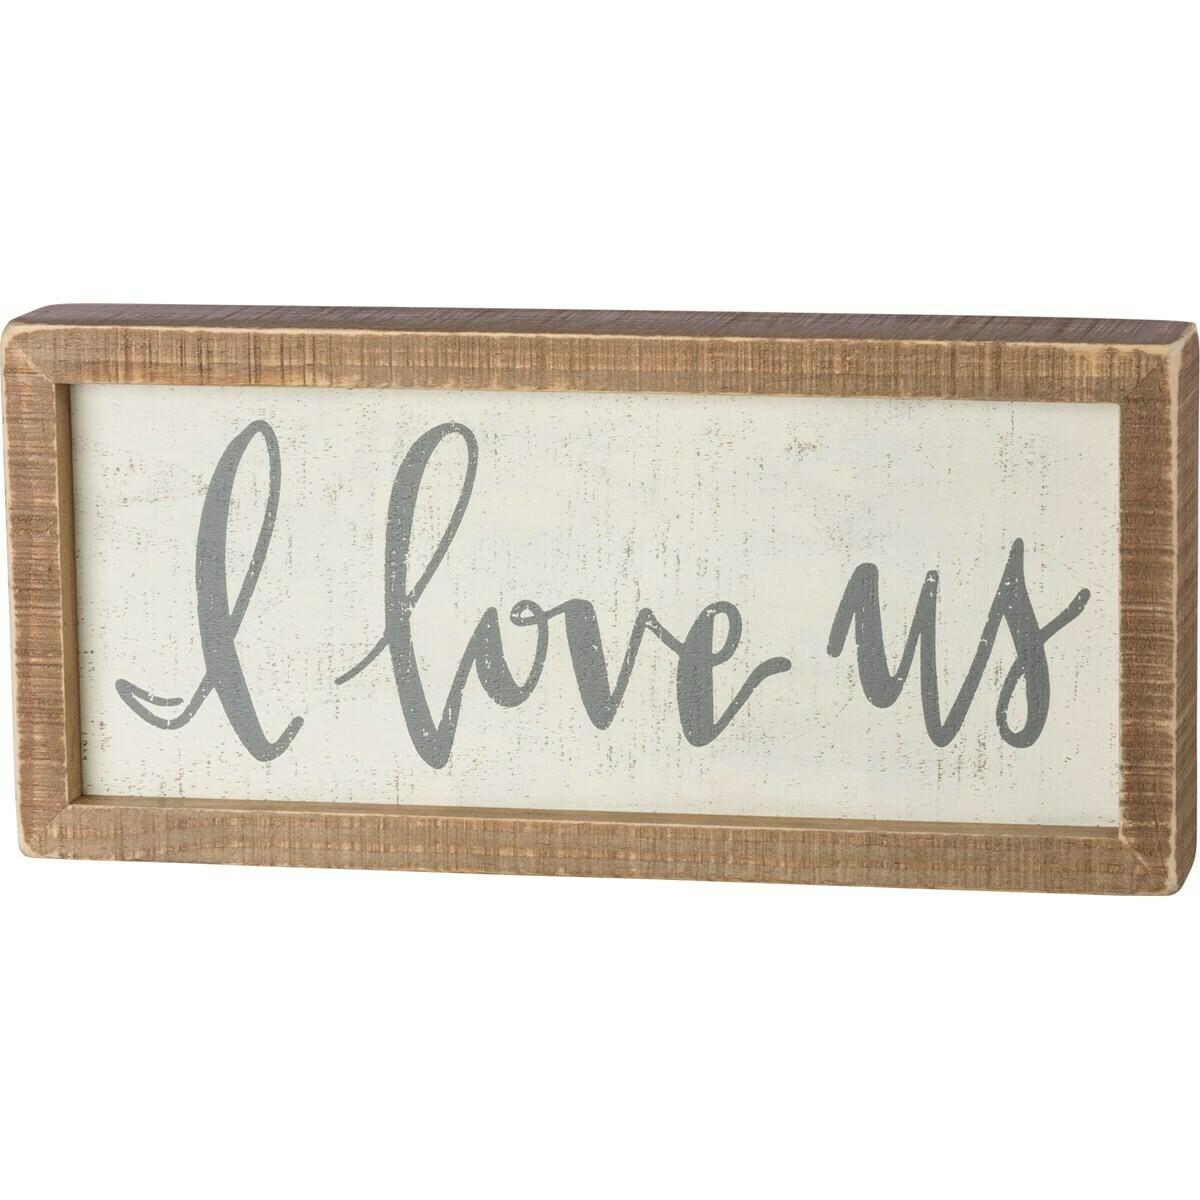 I Love Us Box Sign